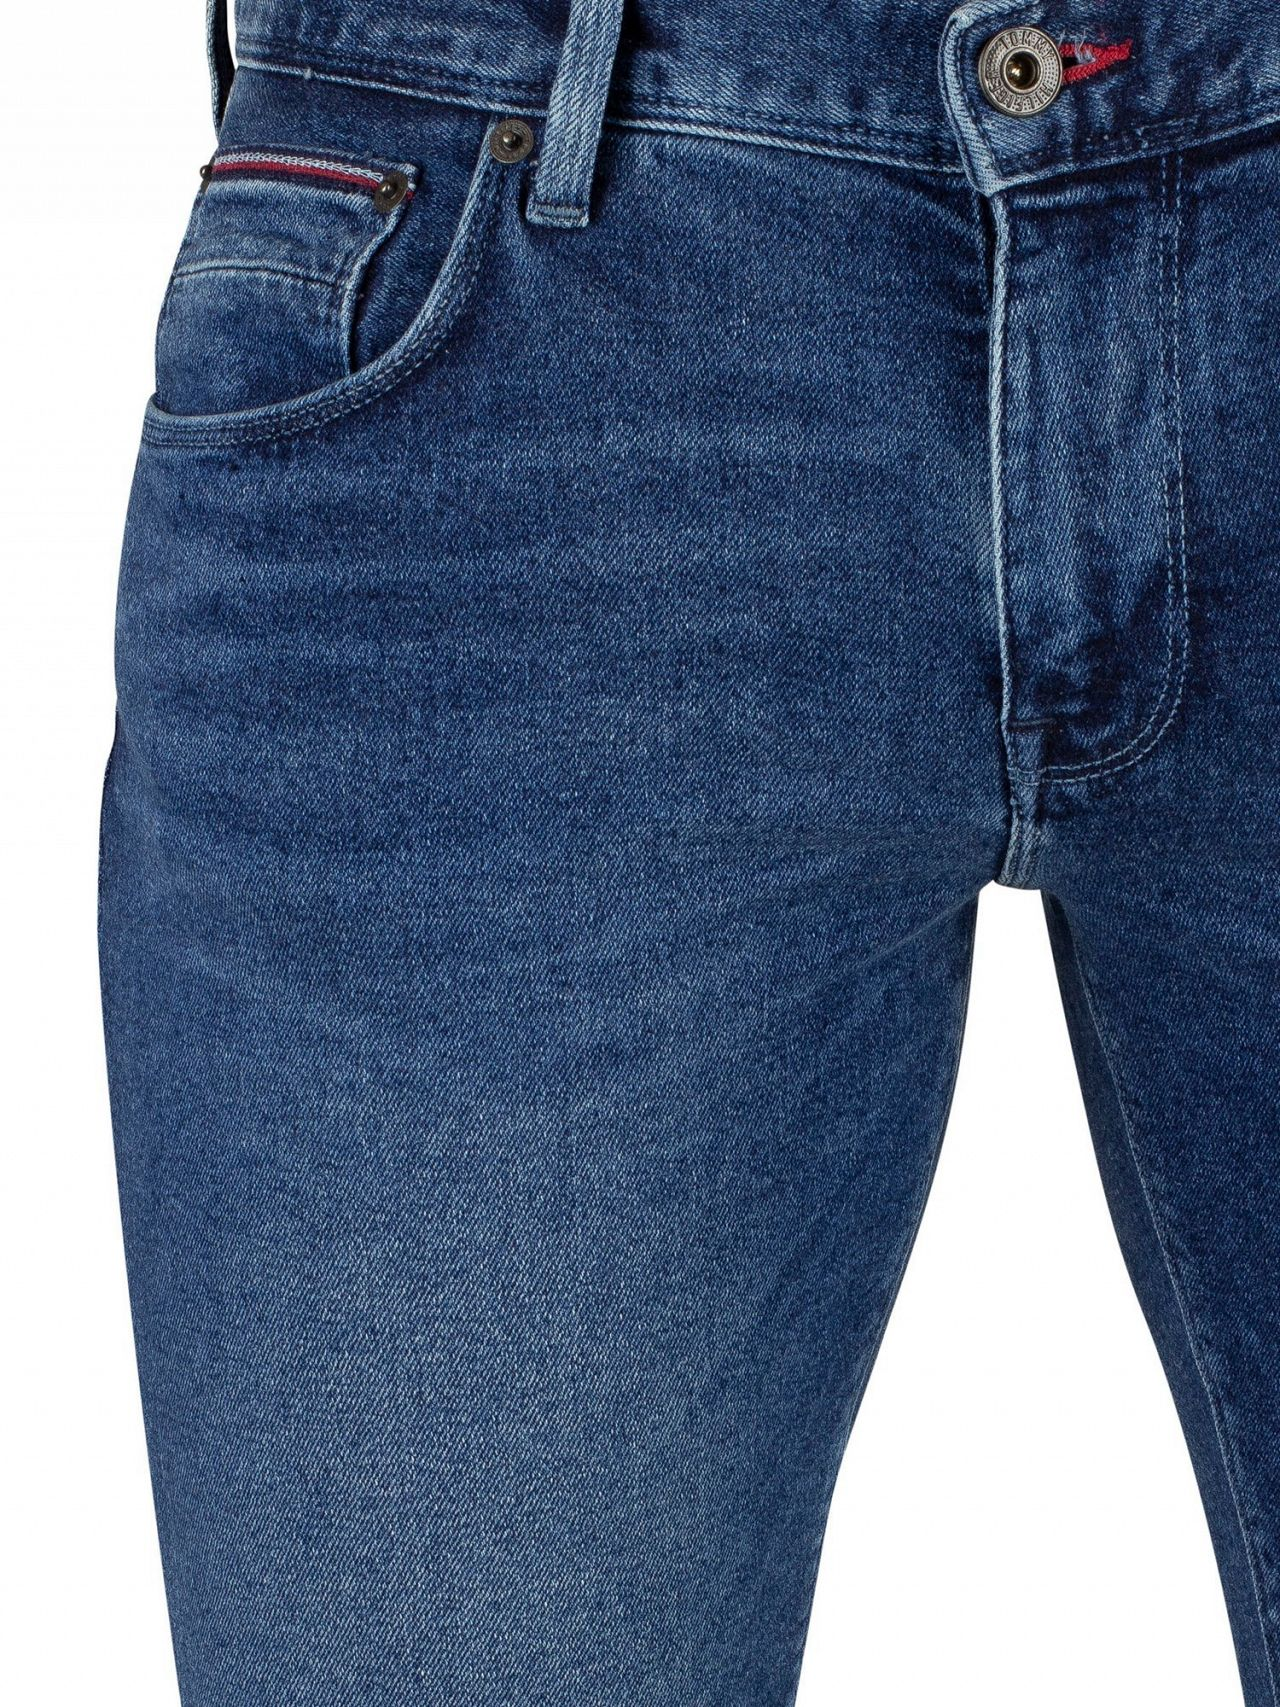 90422822 Tommy Hilfiger Elmore Indigo Denton Straight Fit Jeans | Standout